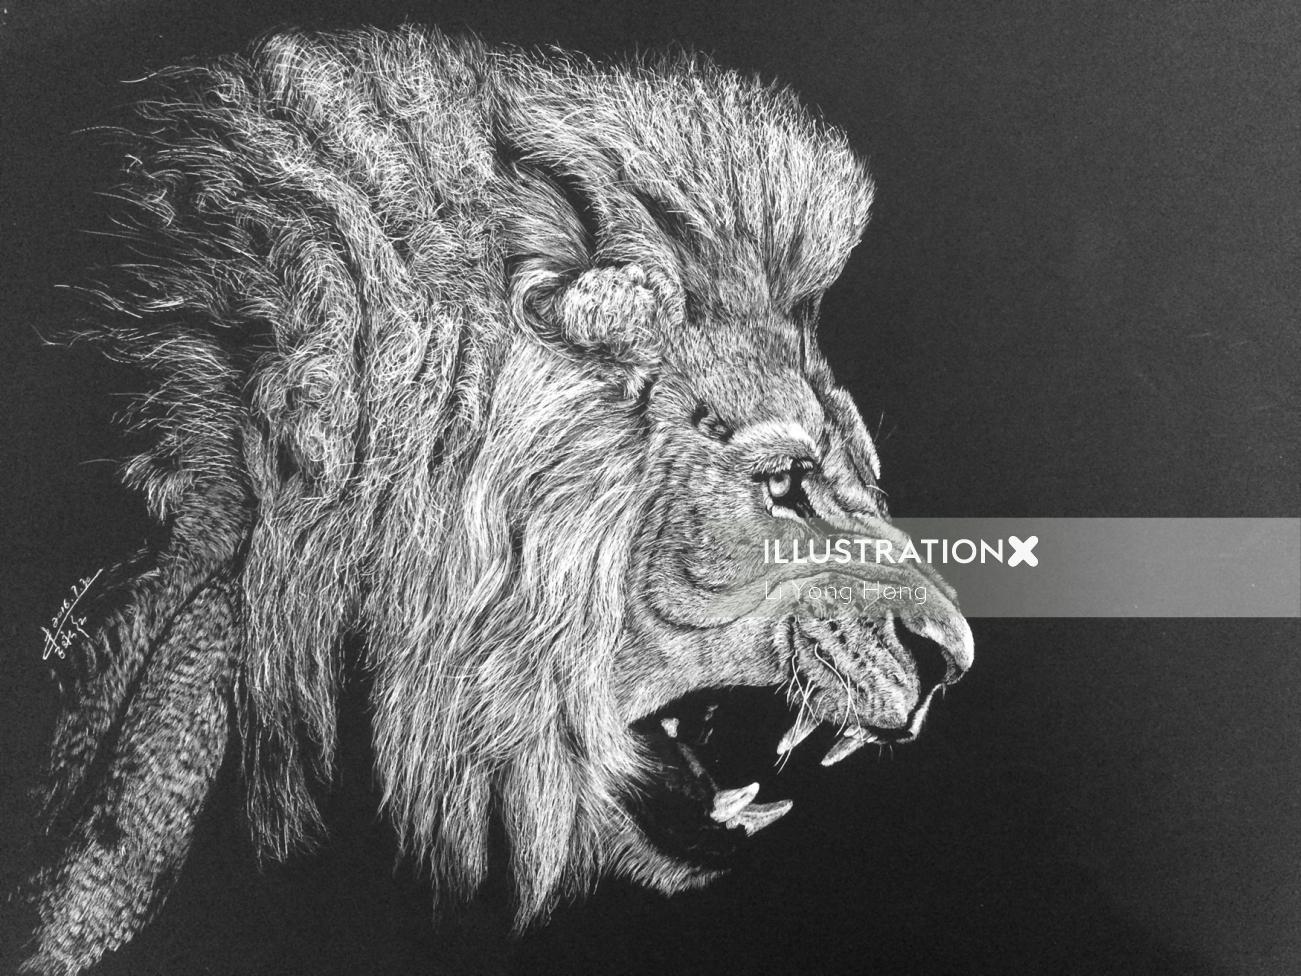 Animal Illustration of roaring lion